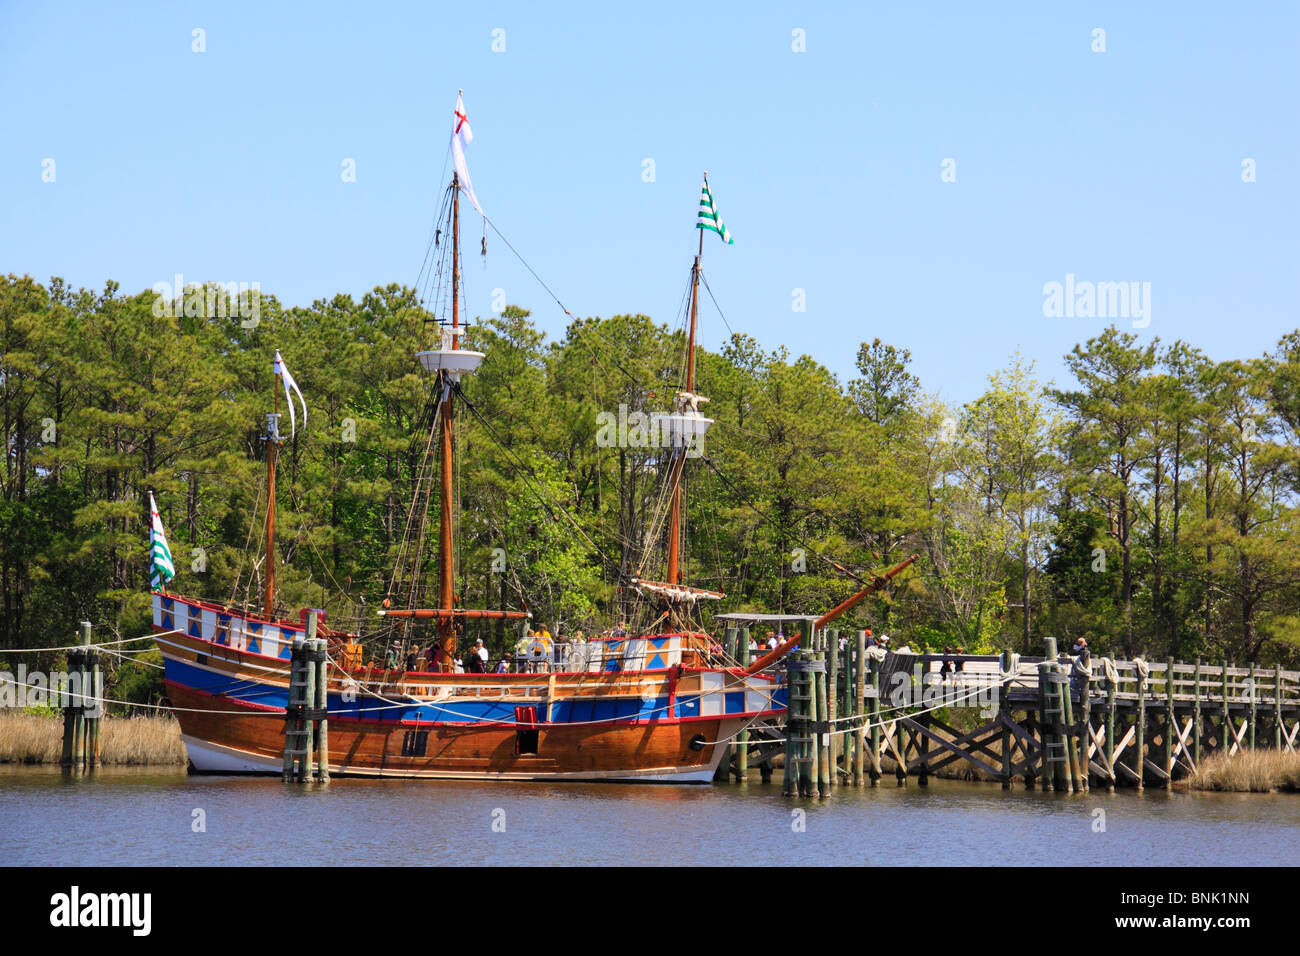 Queen Elizabeth II, Roanoke Island Festival Park, Manteo, North Carolina, USA Stock Photo